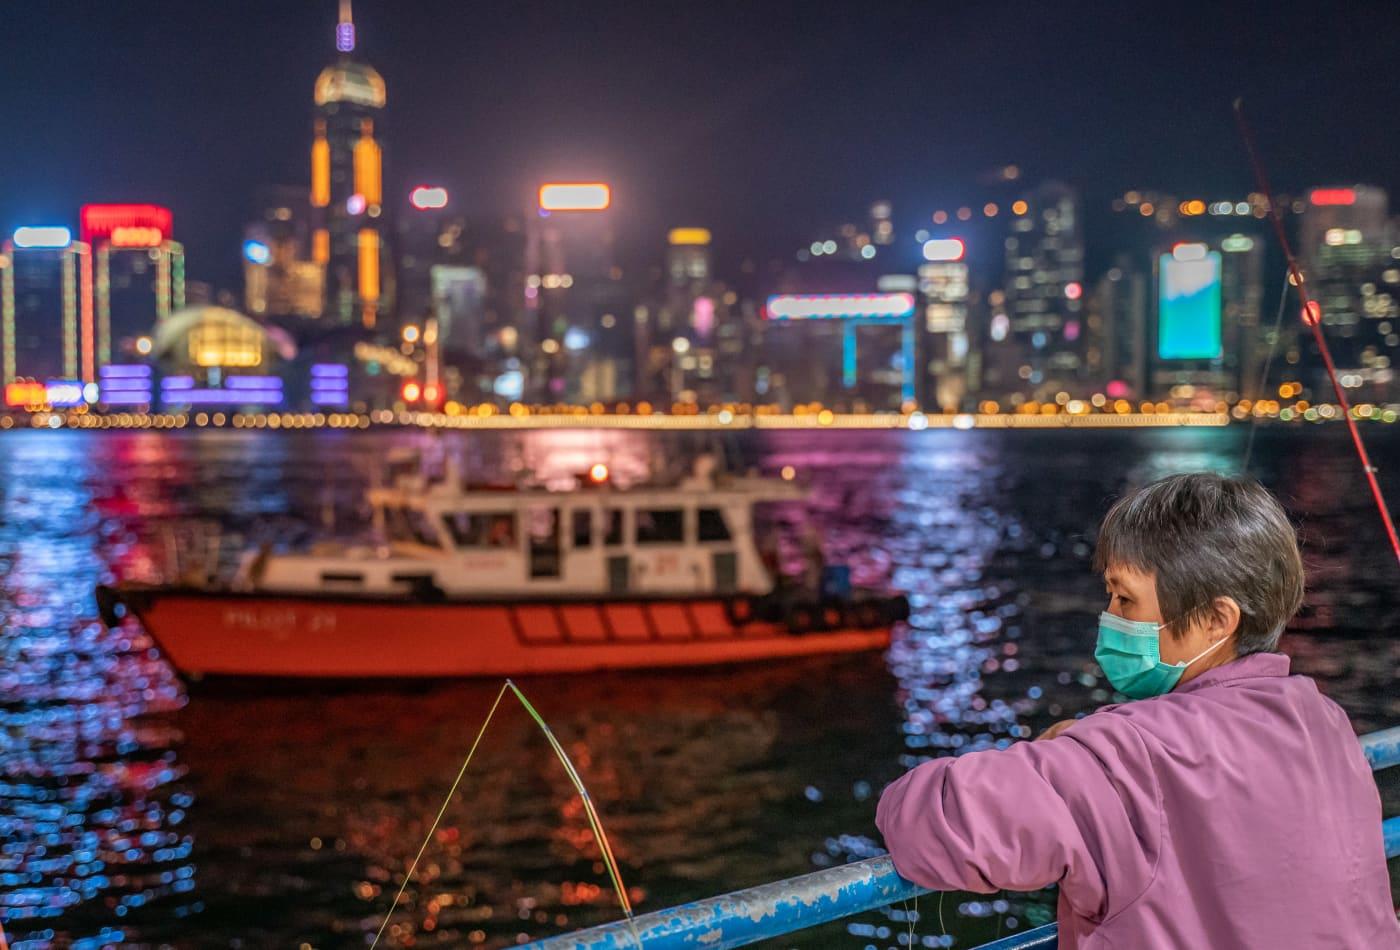 Hong Kong plans $15 billion spending to support its economy amid coronavirus outbreak